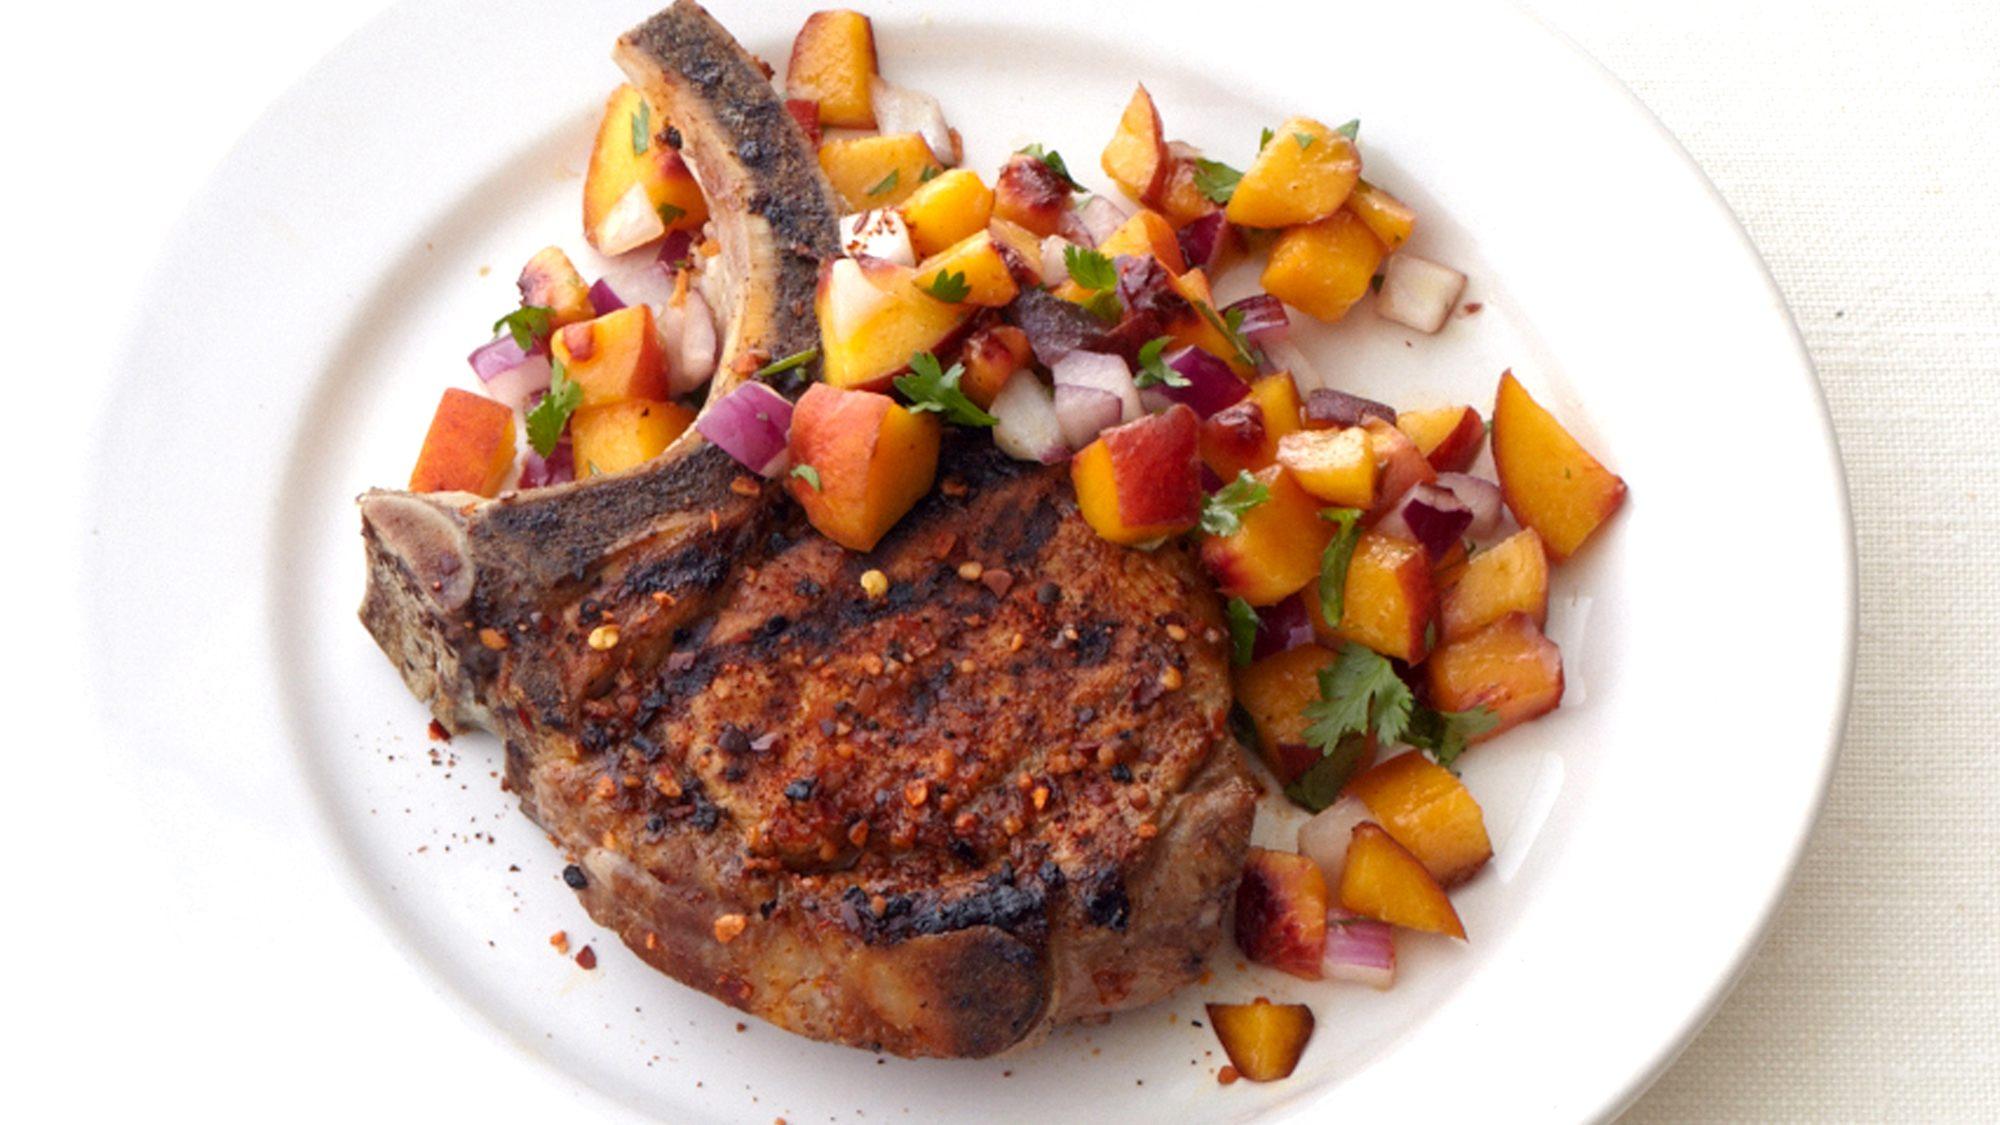 southwestern-spiced-pork-chops-with-peach-salsa.jpg